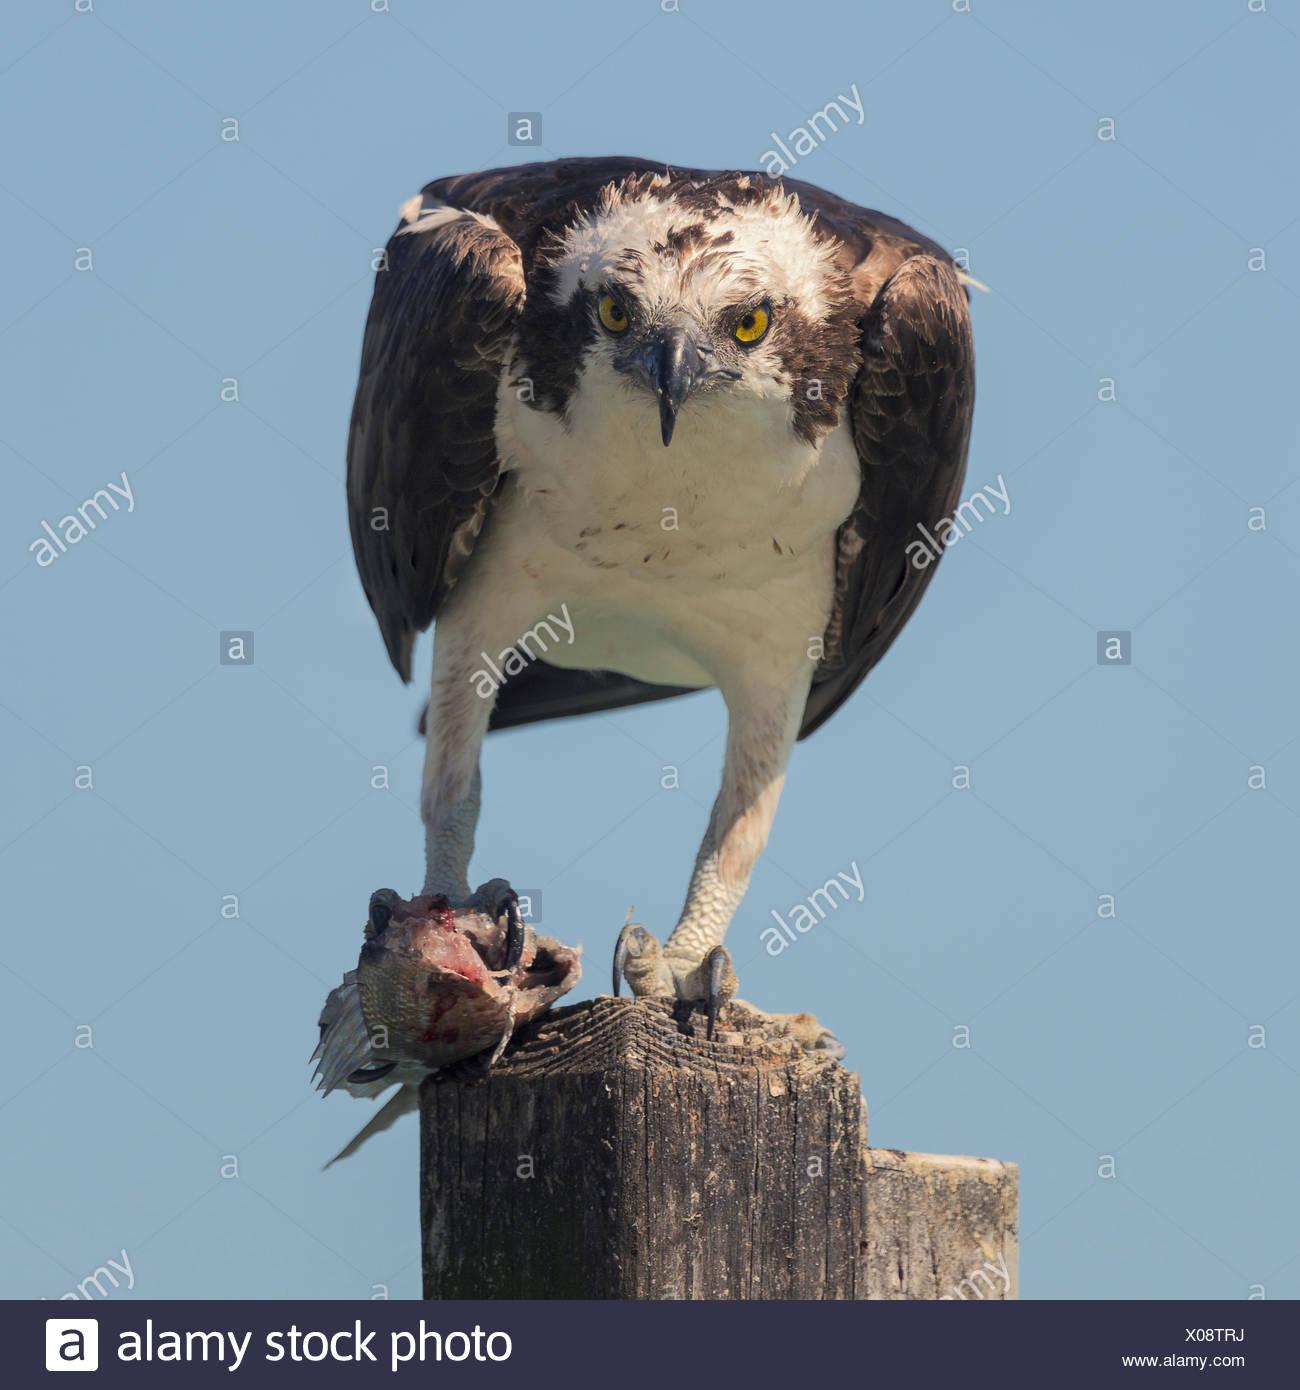 Osprey (Pandion haliaetus) standing on wooden post eating fish, Sarasota, Florida, America, USA - Stock Image